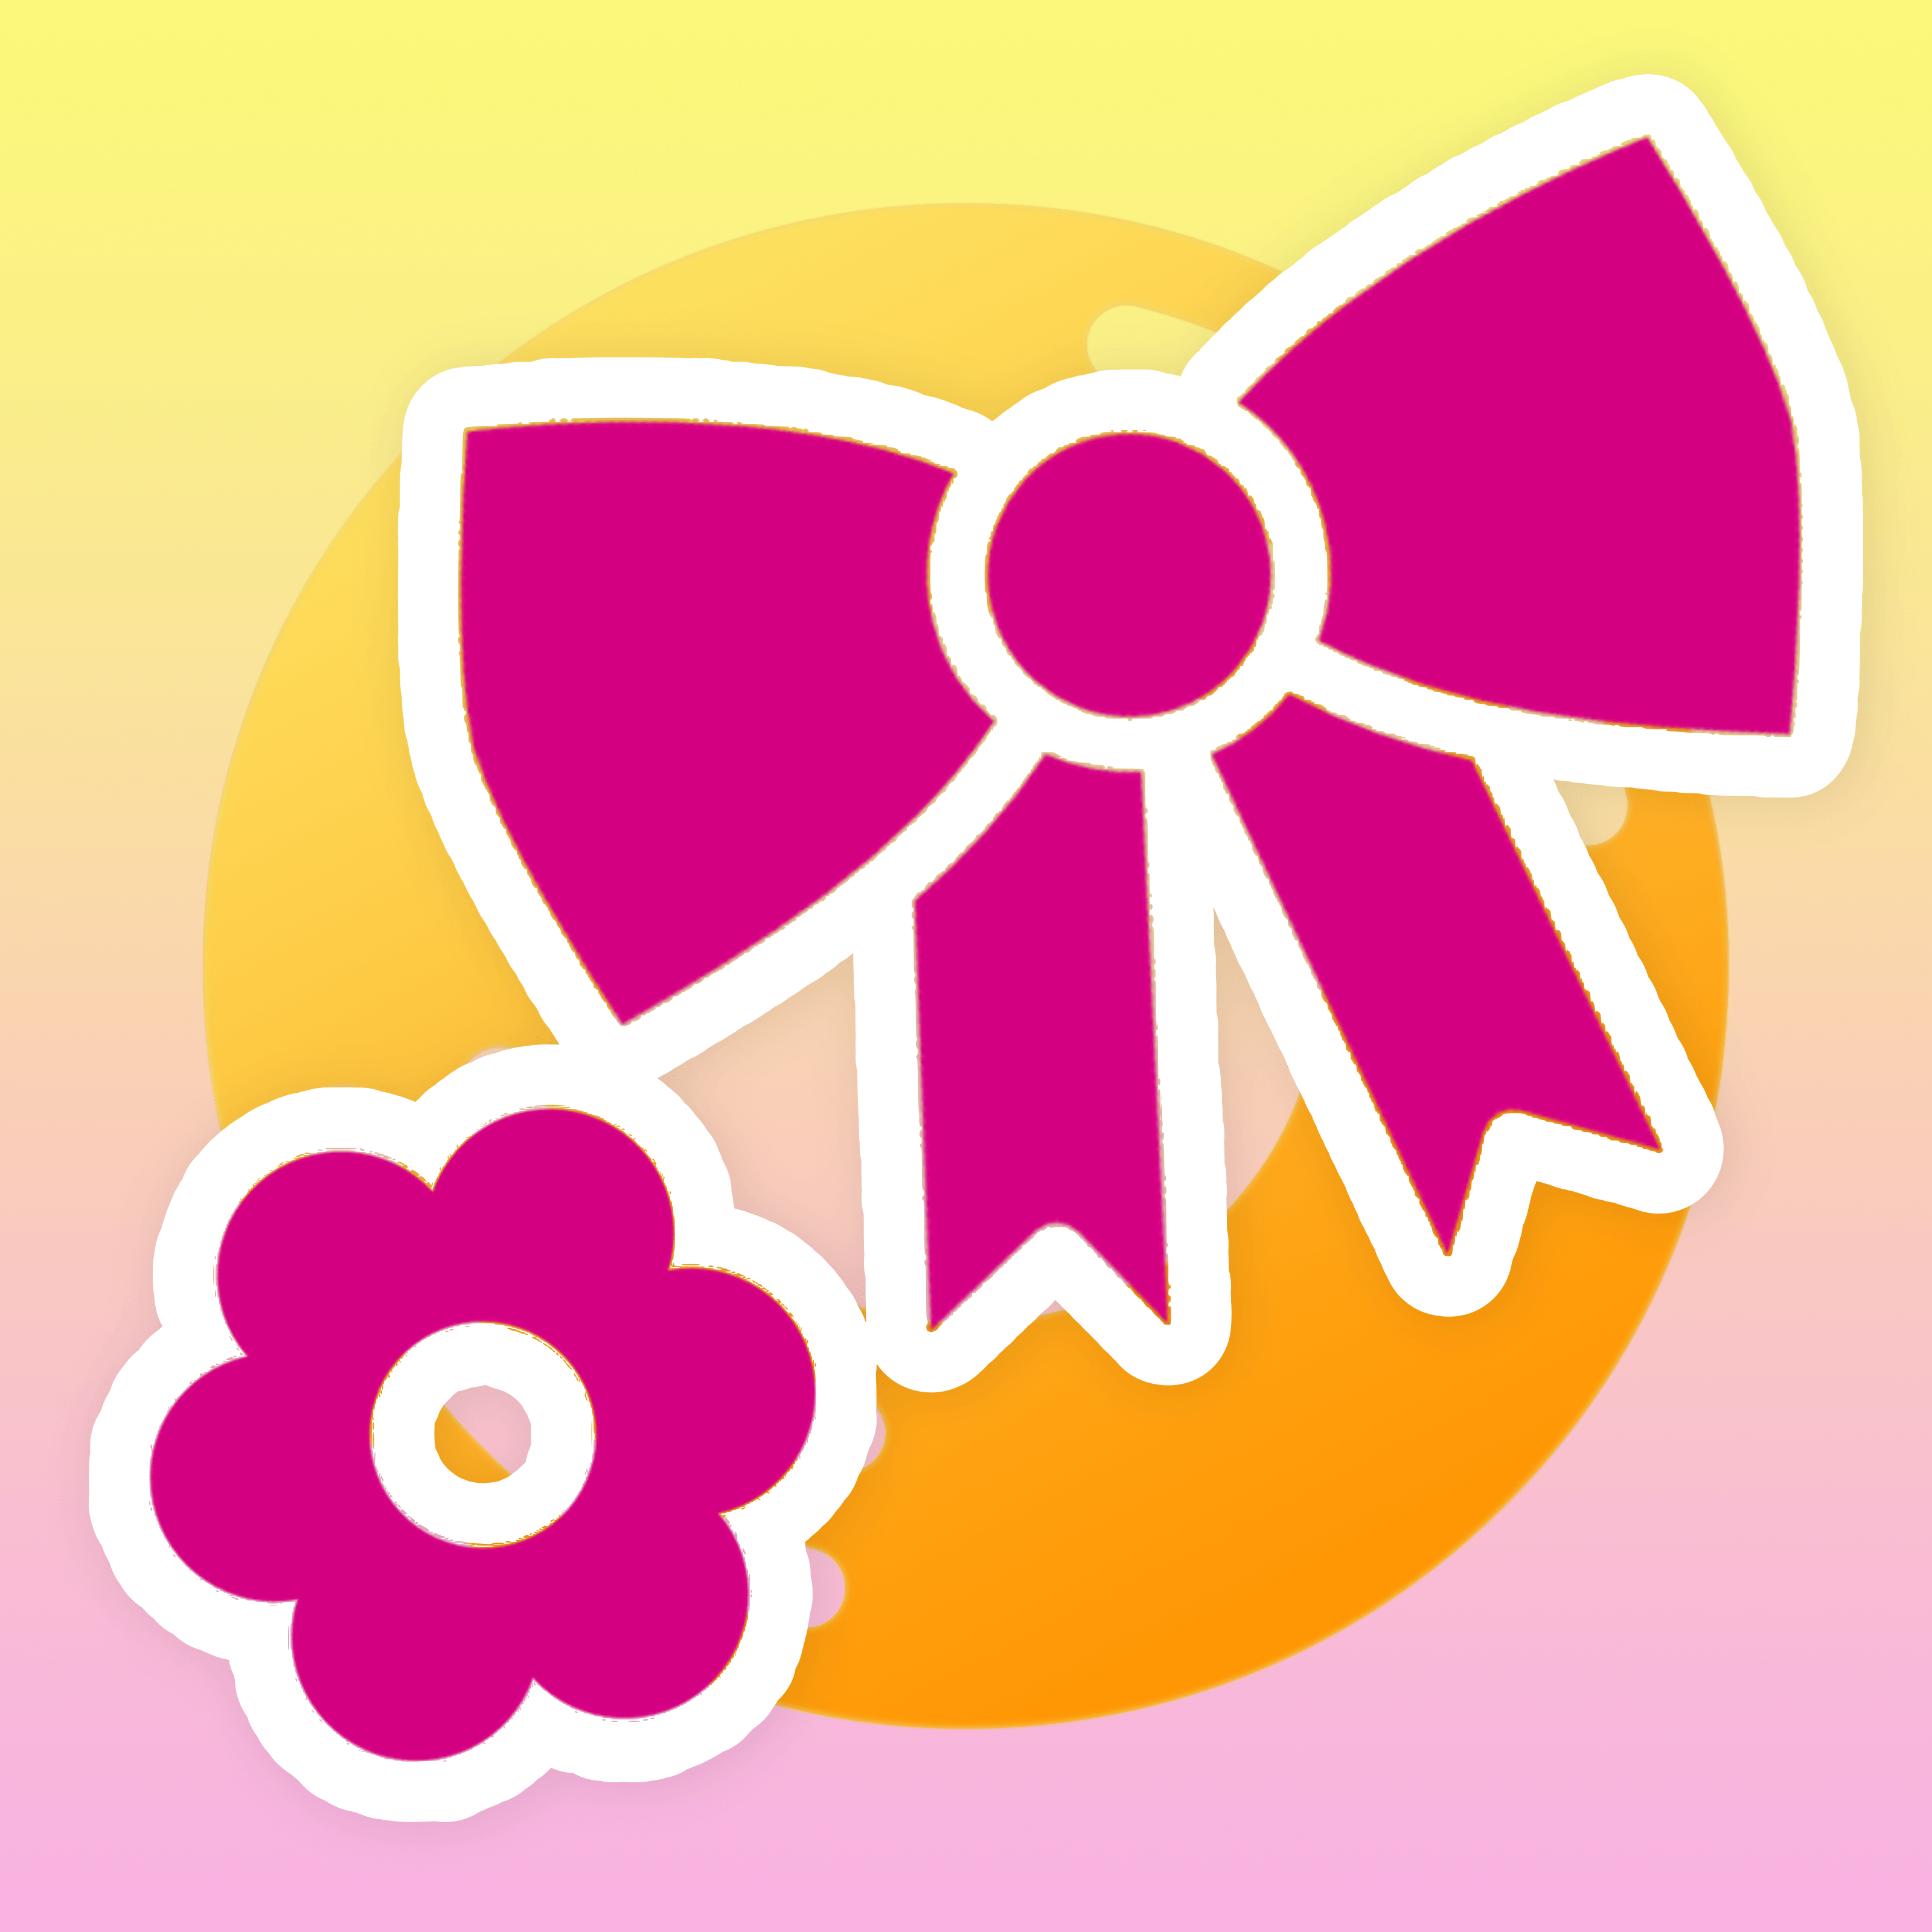 Fenixiejpg avatar